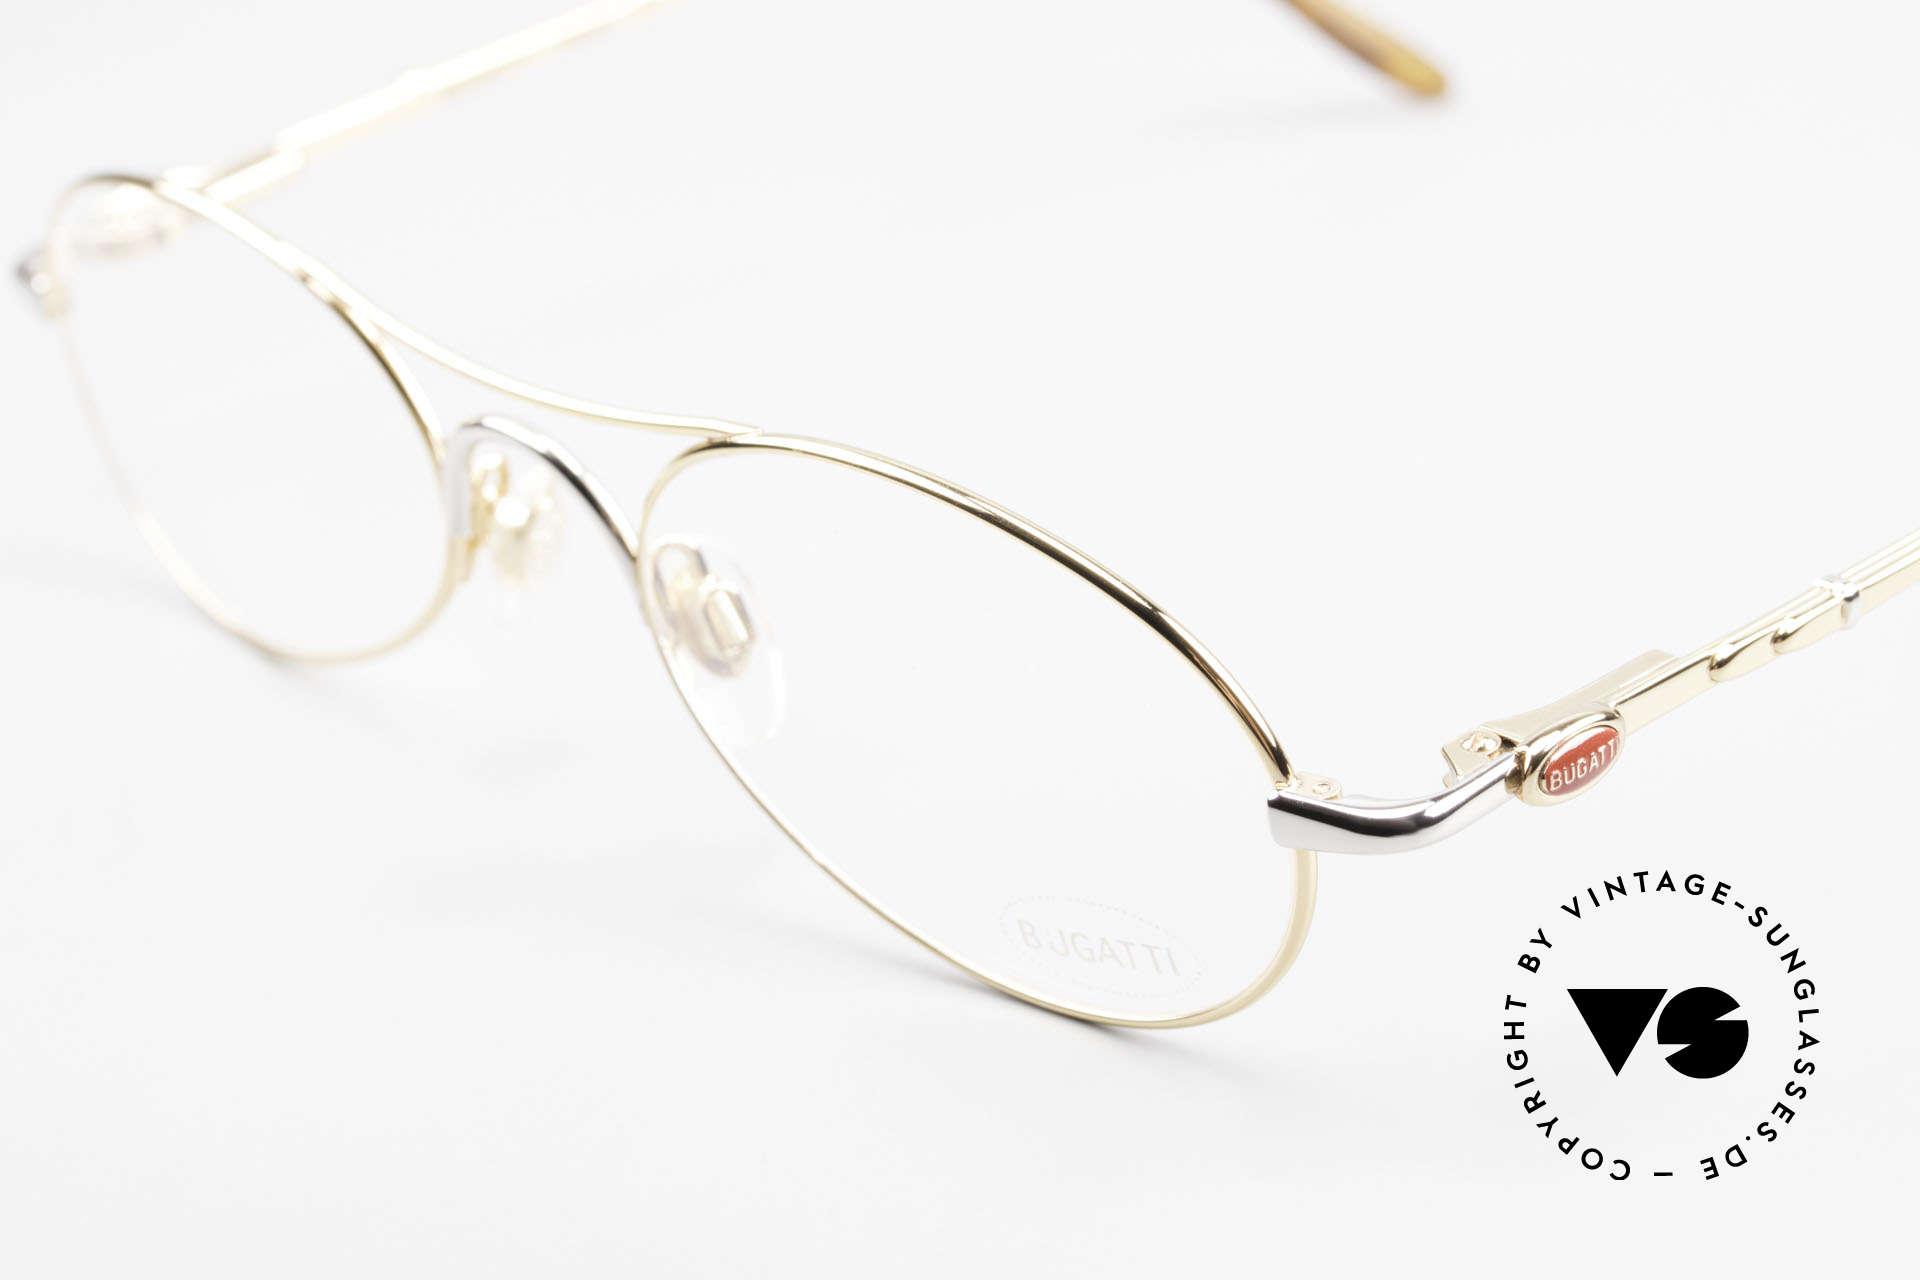 Bugatti 10608 90's Luxury Men's Eyeglasses, unworn (like all our rare vintage Bugatti eyeglasses), Made for Men